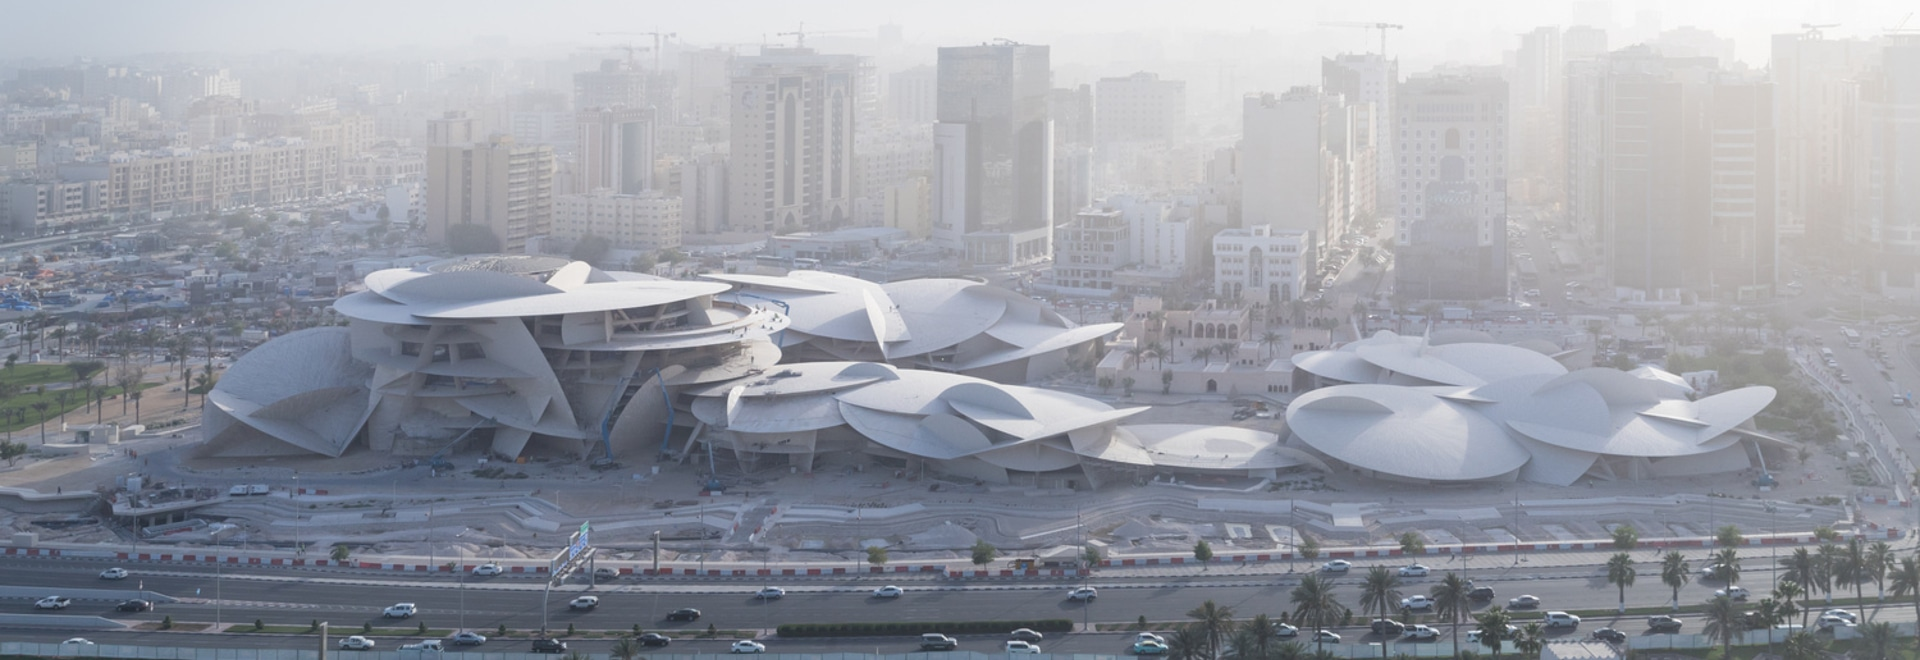 Nationales Museum von Katar / Atelier Jean Nouvel